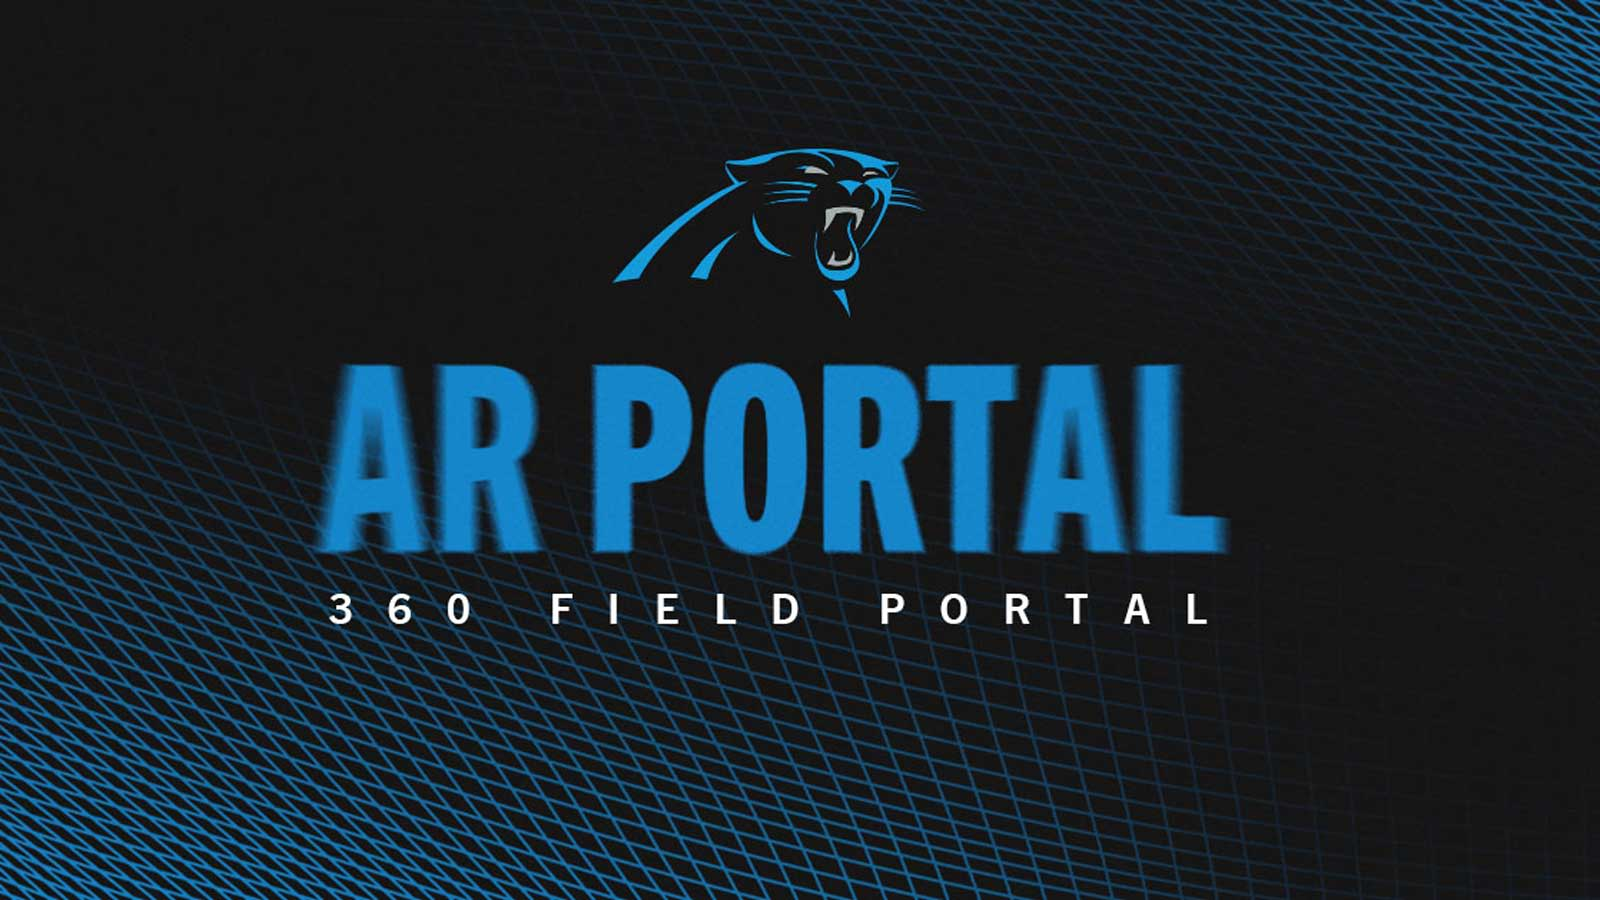 AR Portal